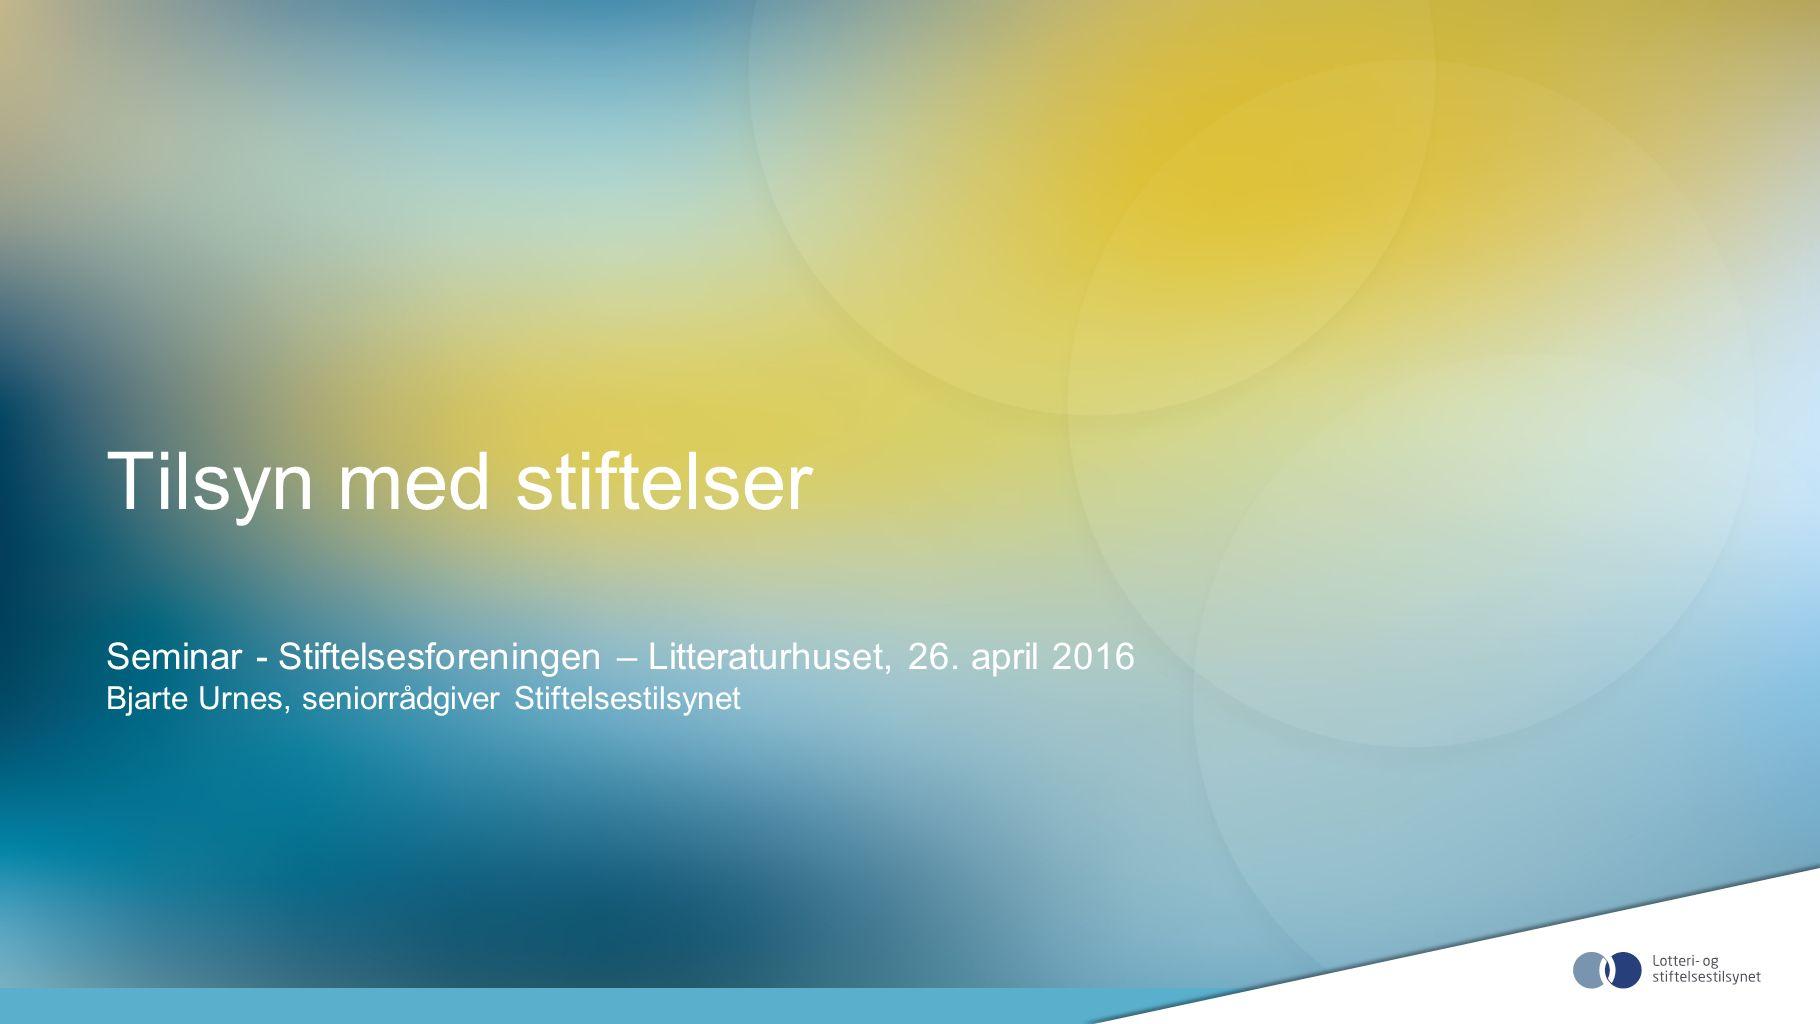 Tilsyn med stiftelser Seminar - Stiftelsesforeningen – Litteraturhuset, 26. april 2016 Bjarte Urnes, seniorrådgiver Stiftelsestilsynet